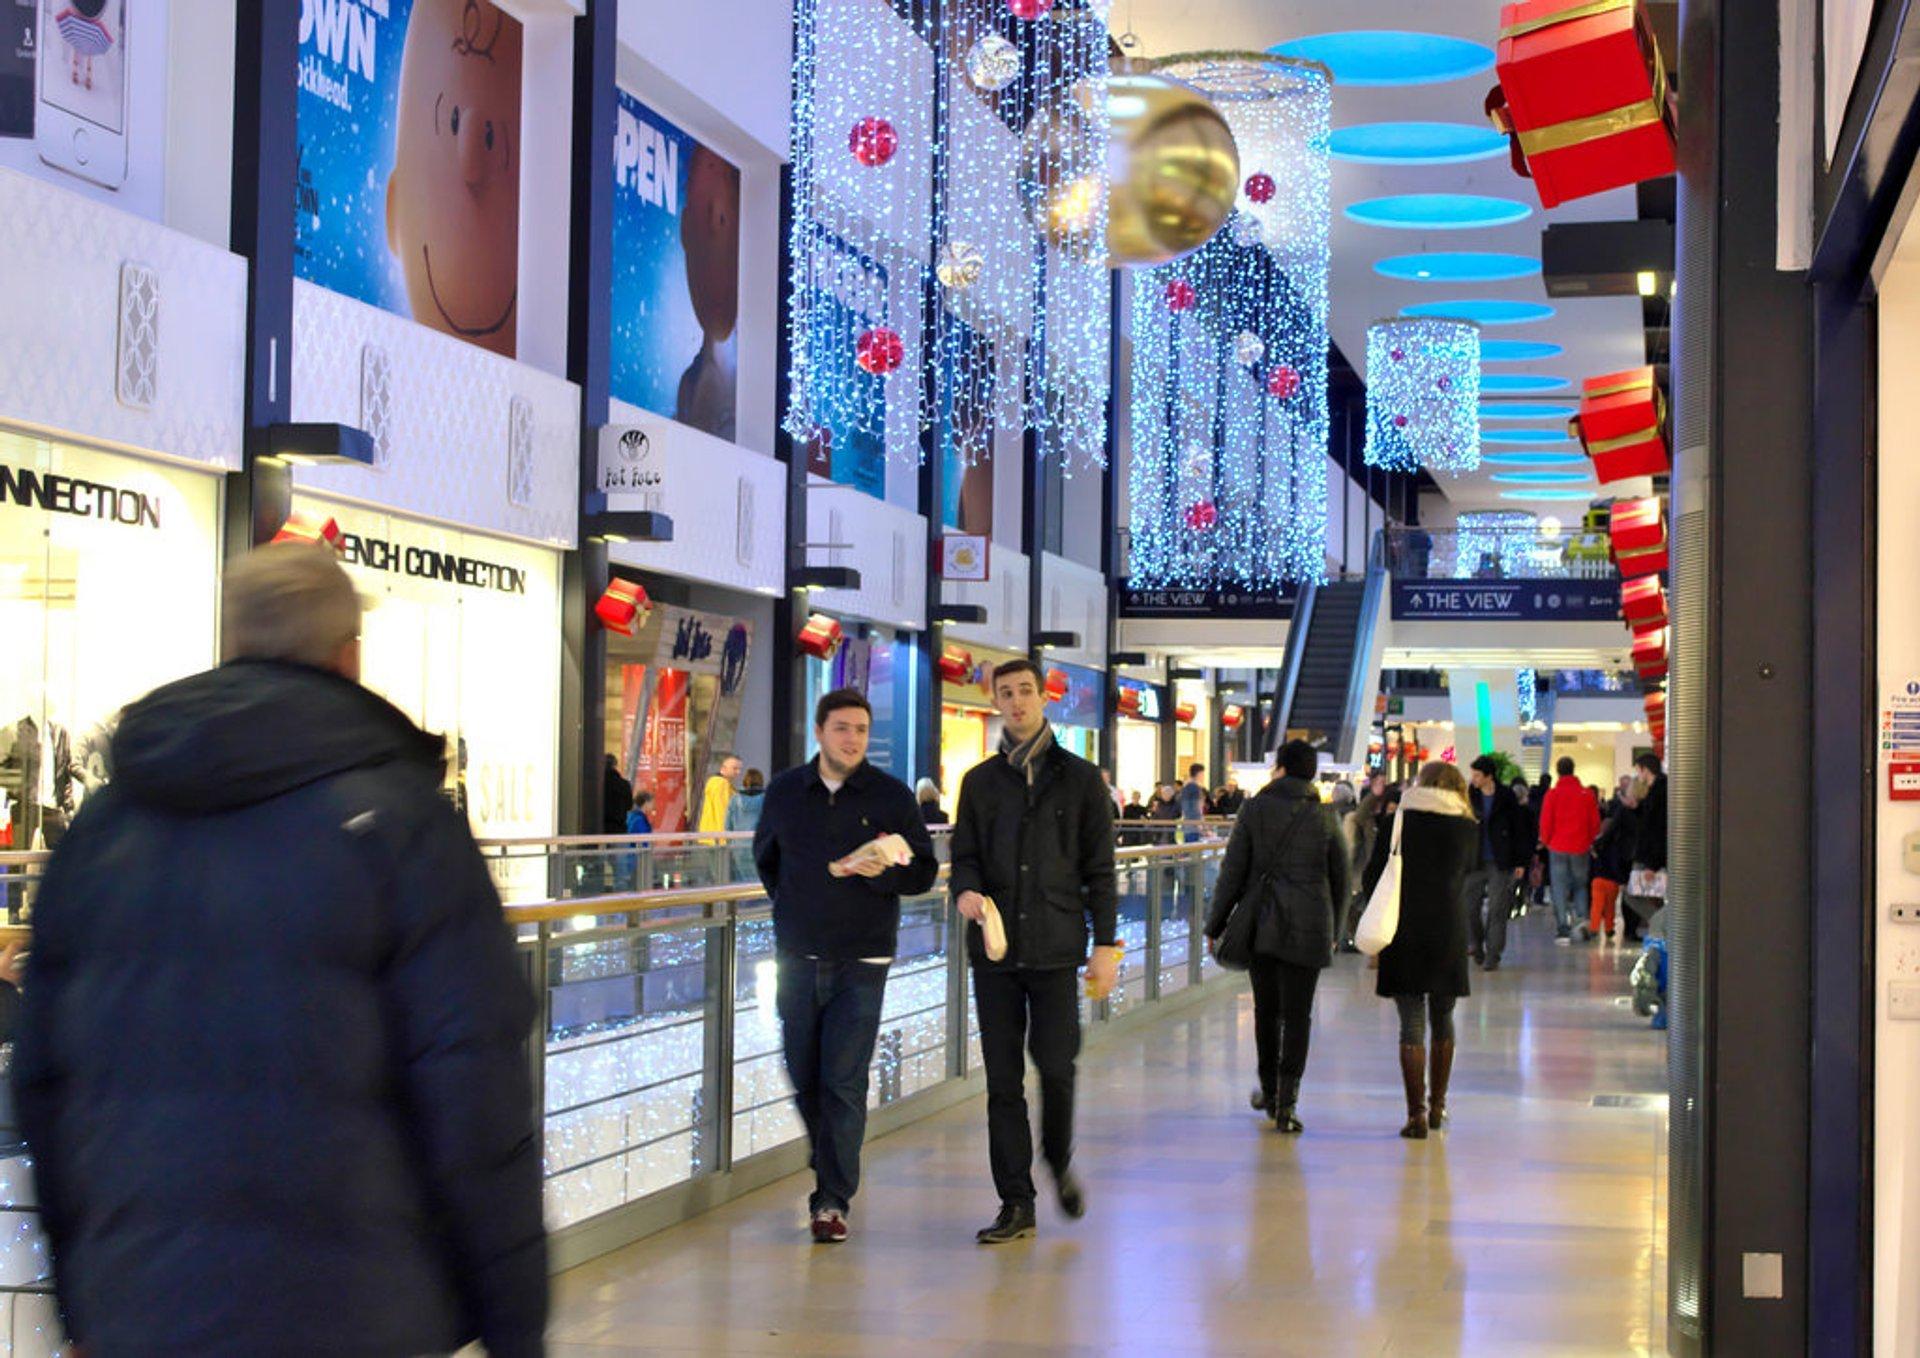 Edinburgh Christmas in Shopping Centre 2020